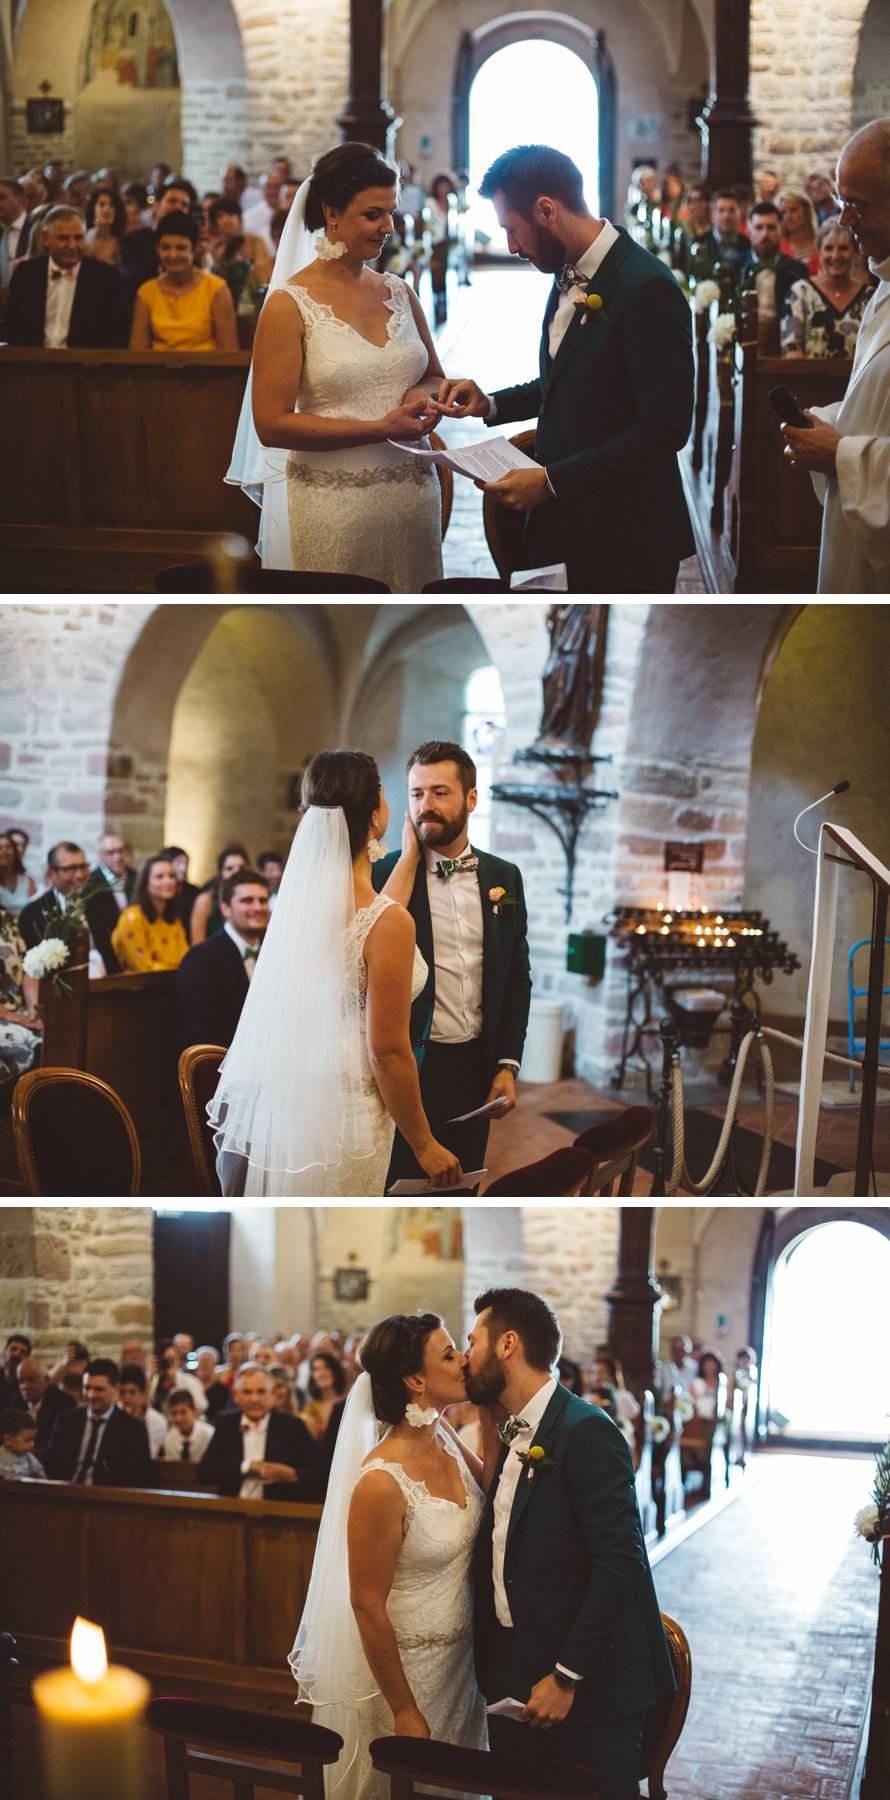 mariage-tropical-raben-horben_0011.jpg